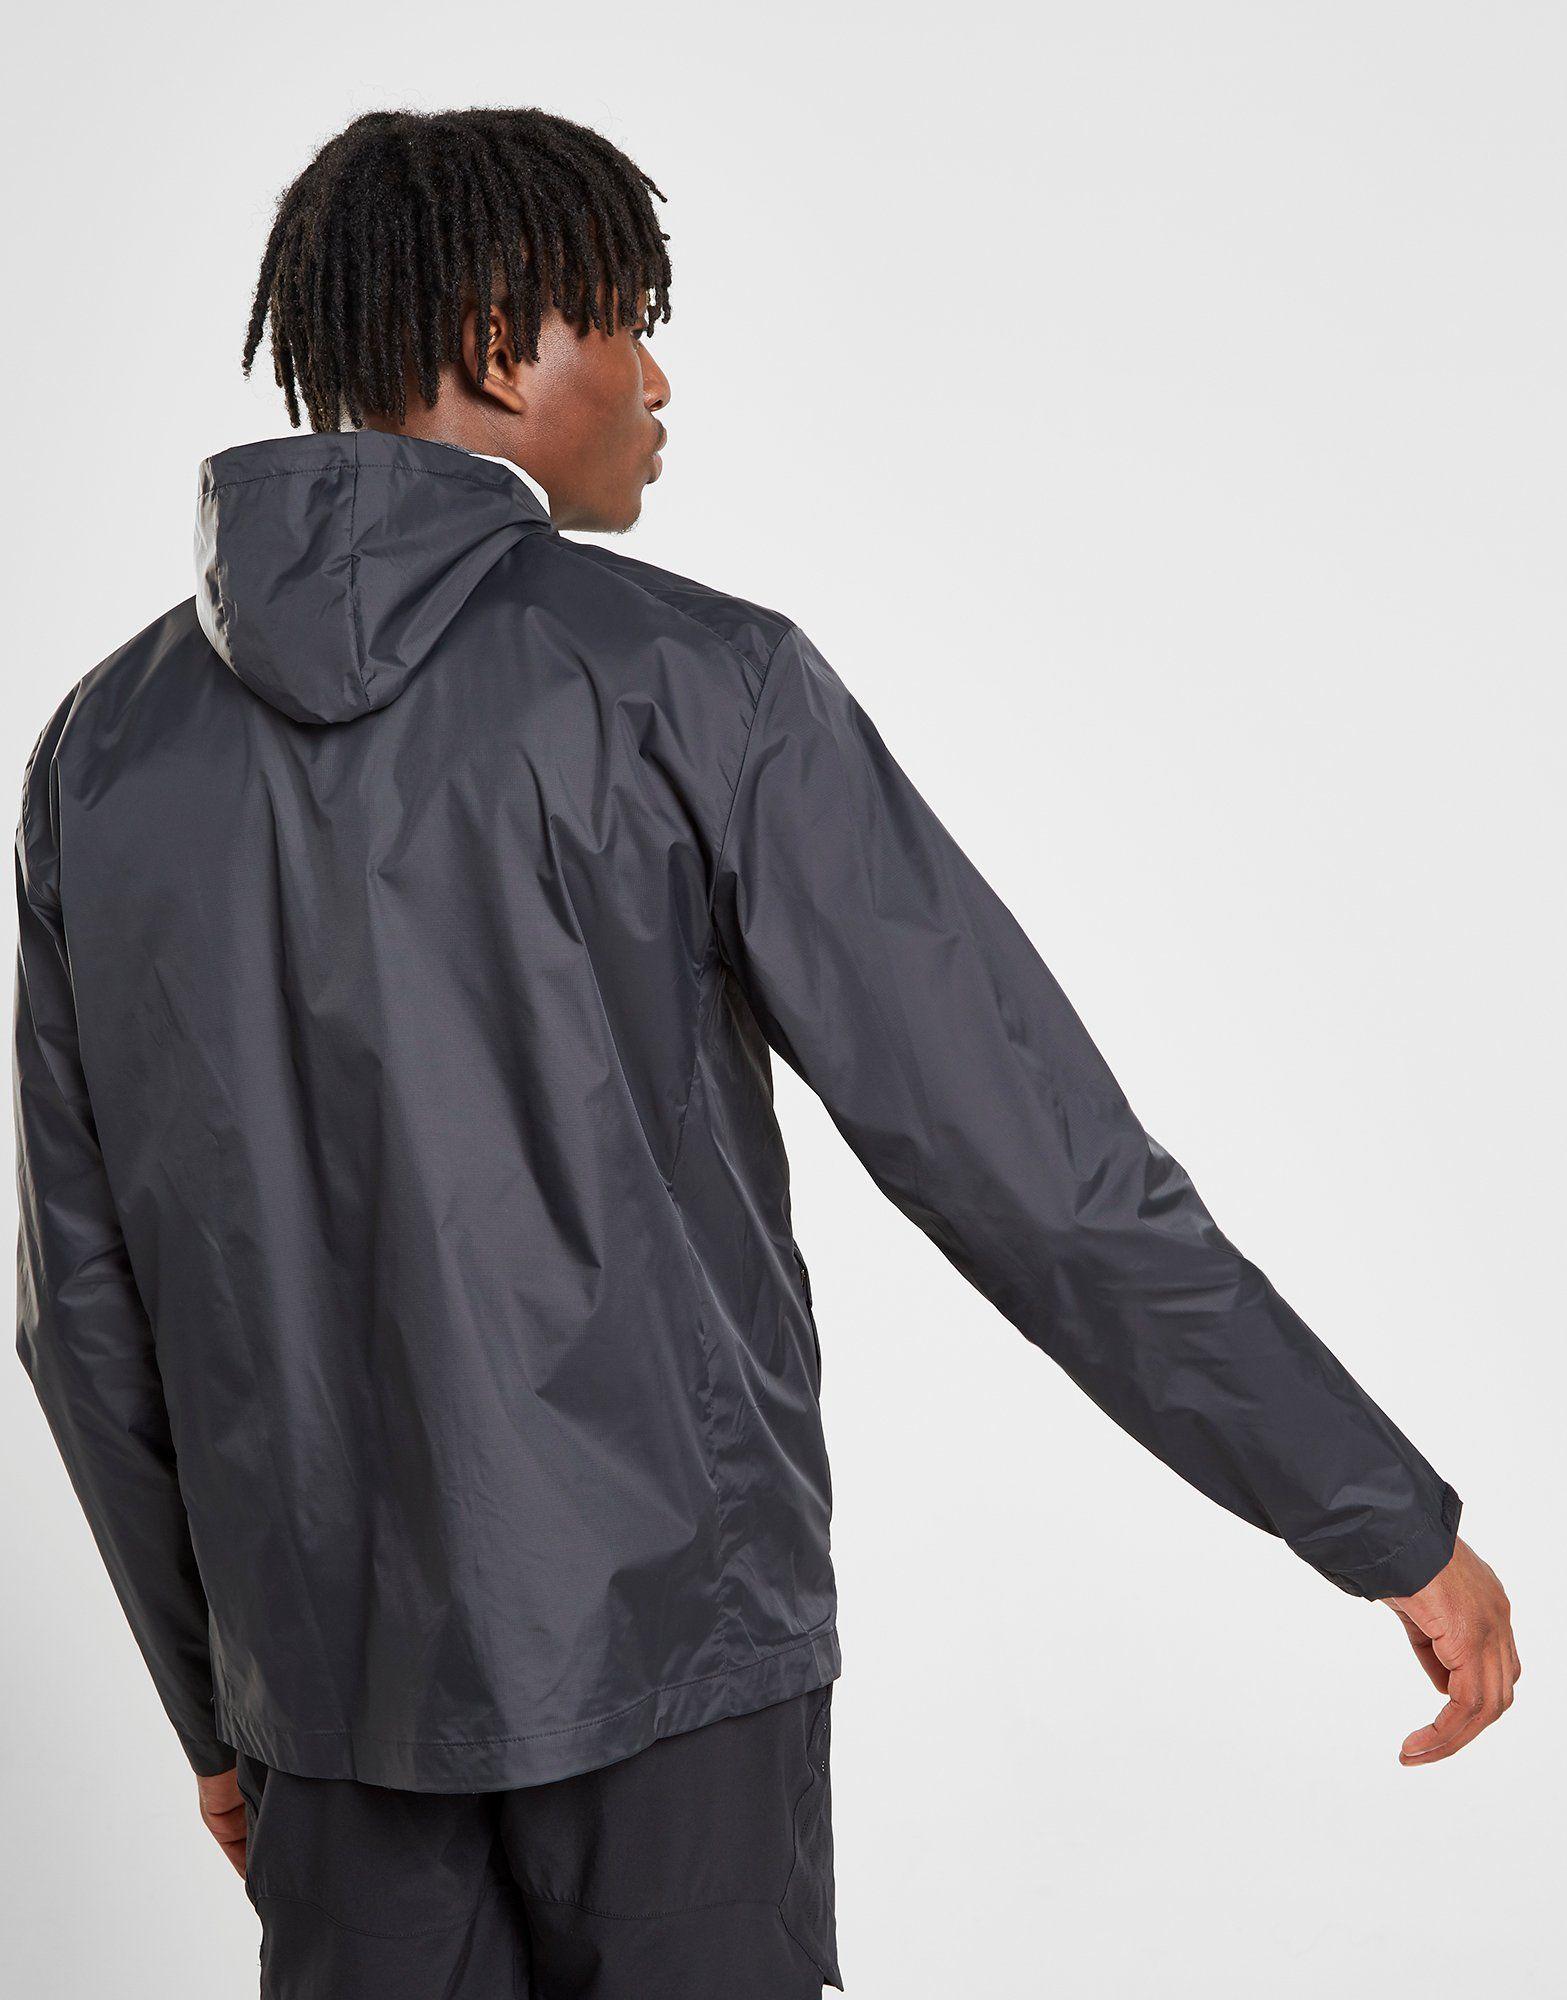 New Balance Woven Windbreaker Jacket